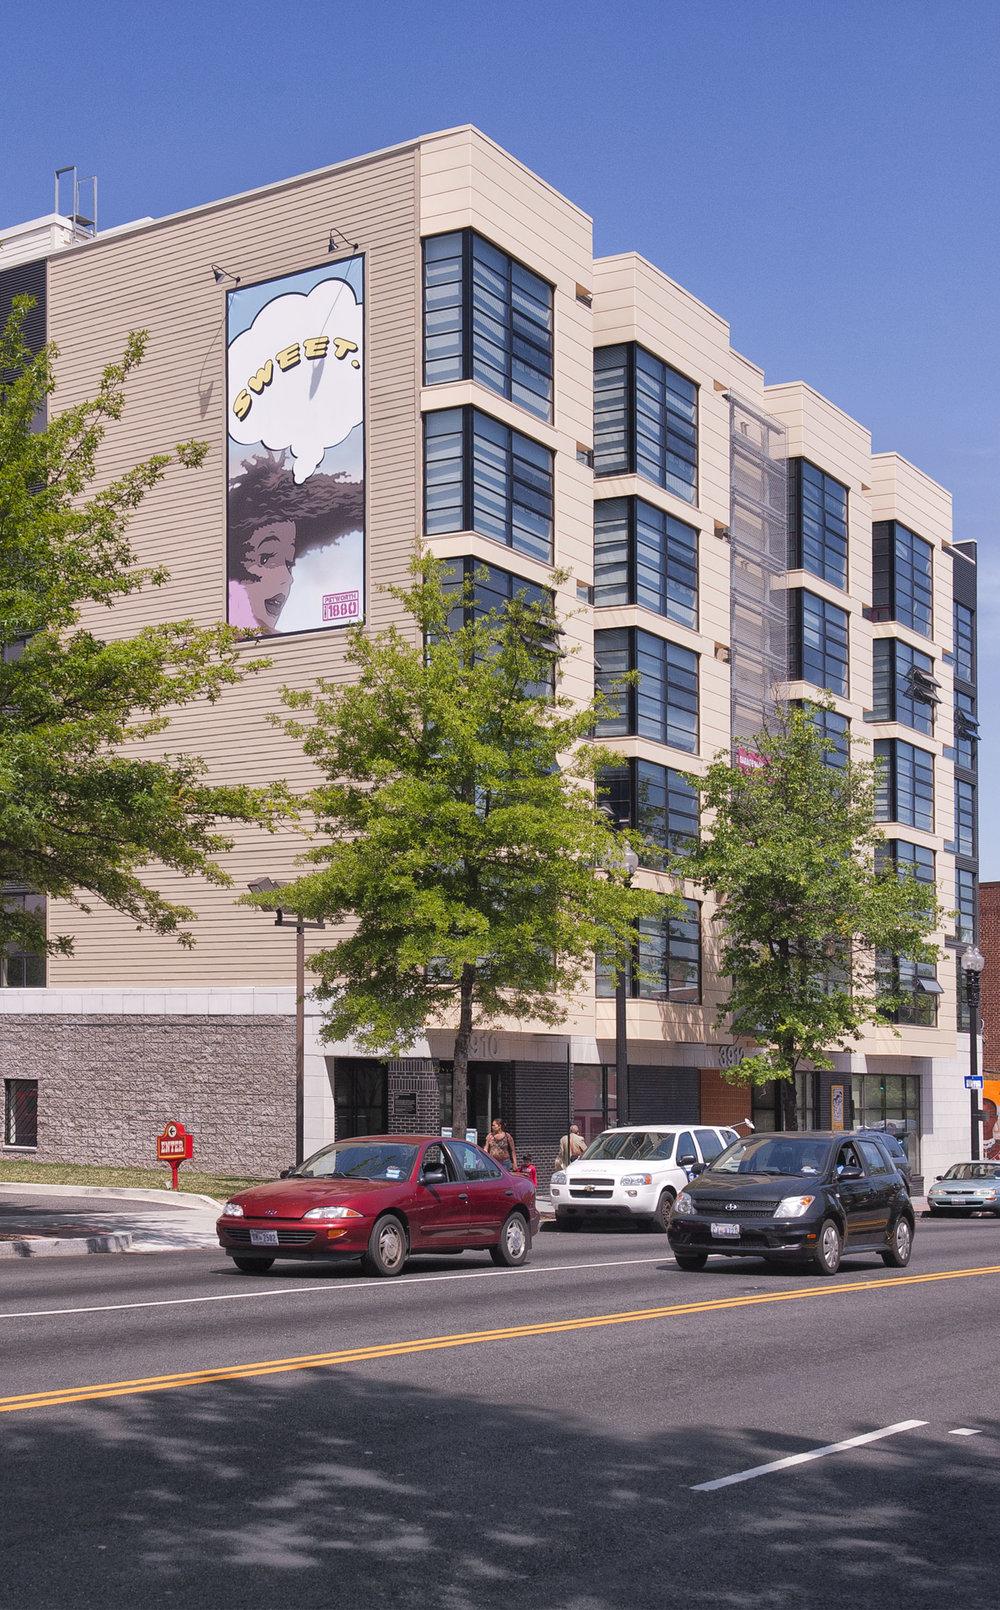 Three Tree Flats  • 130 apartments • Ground floor retail •Petworth, NW Washington, DC